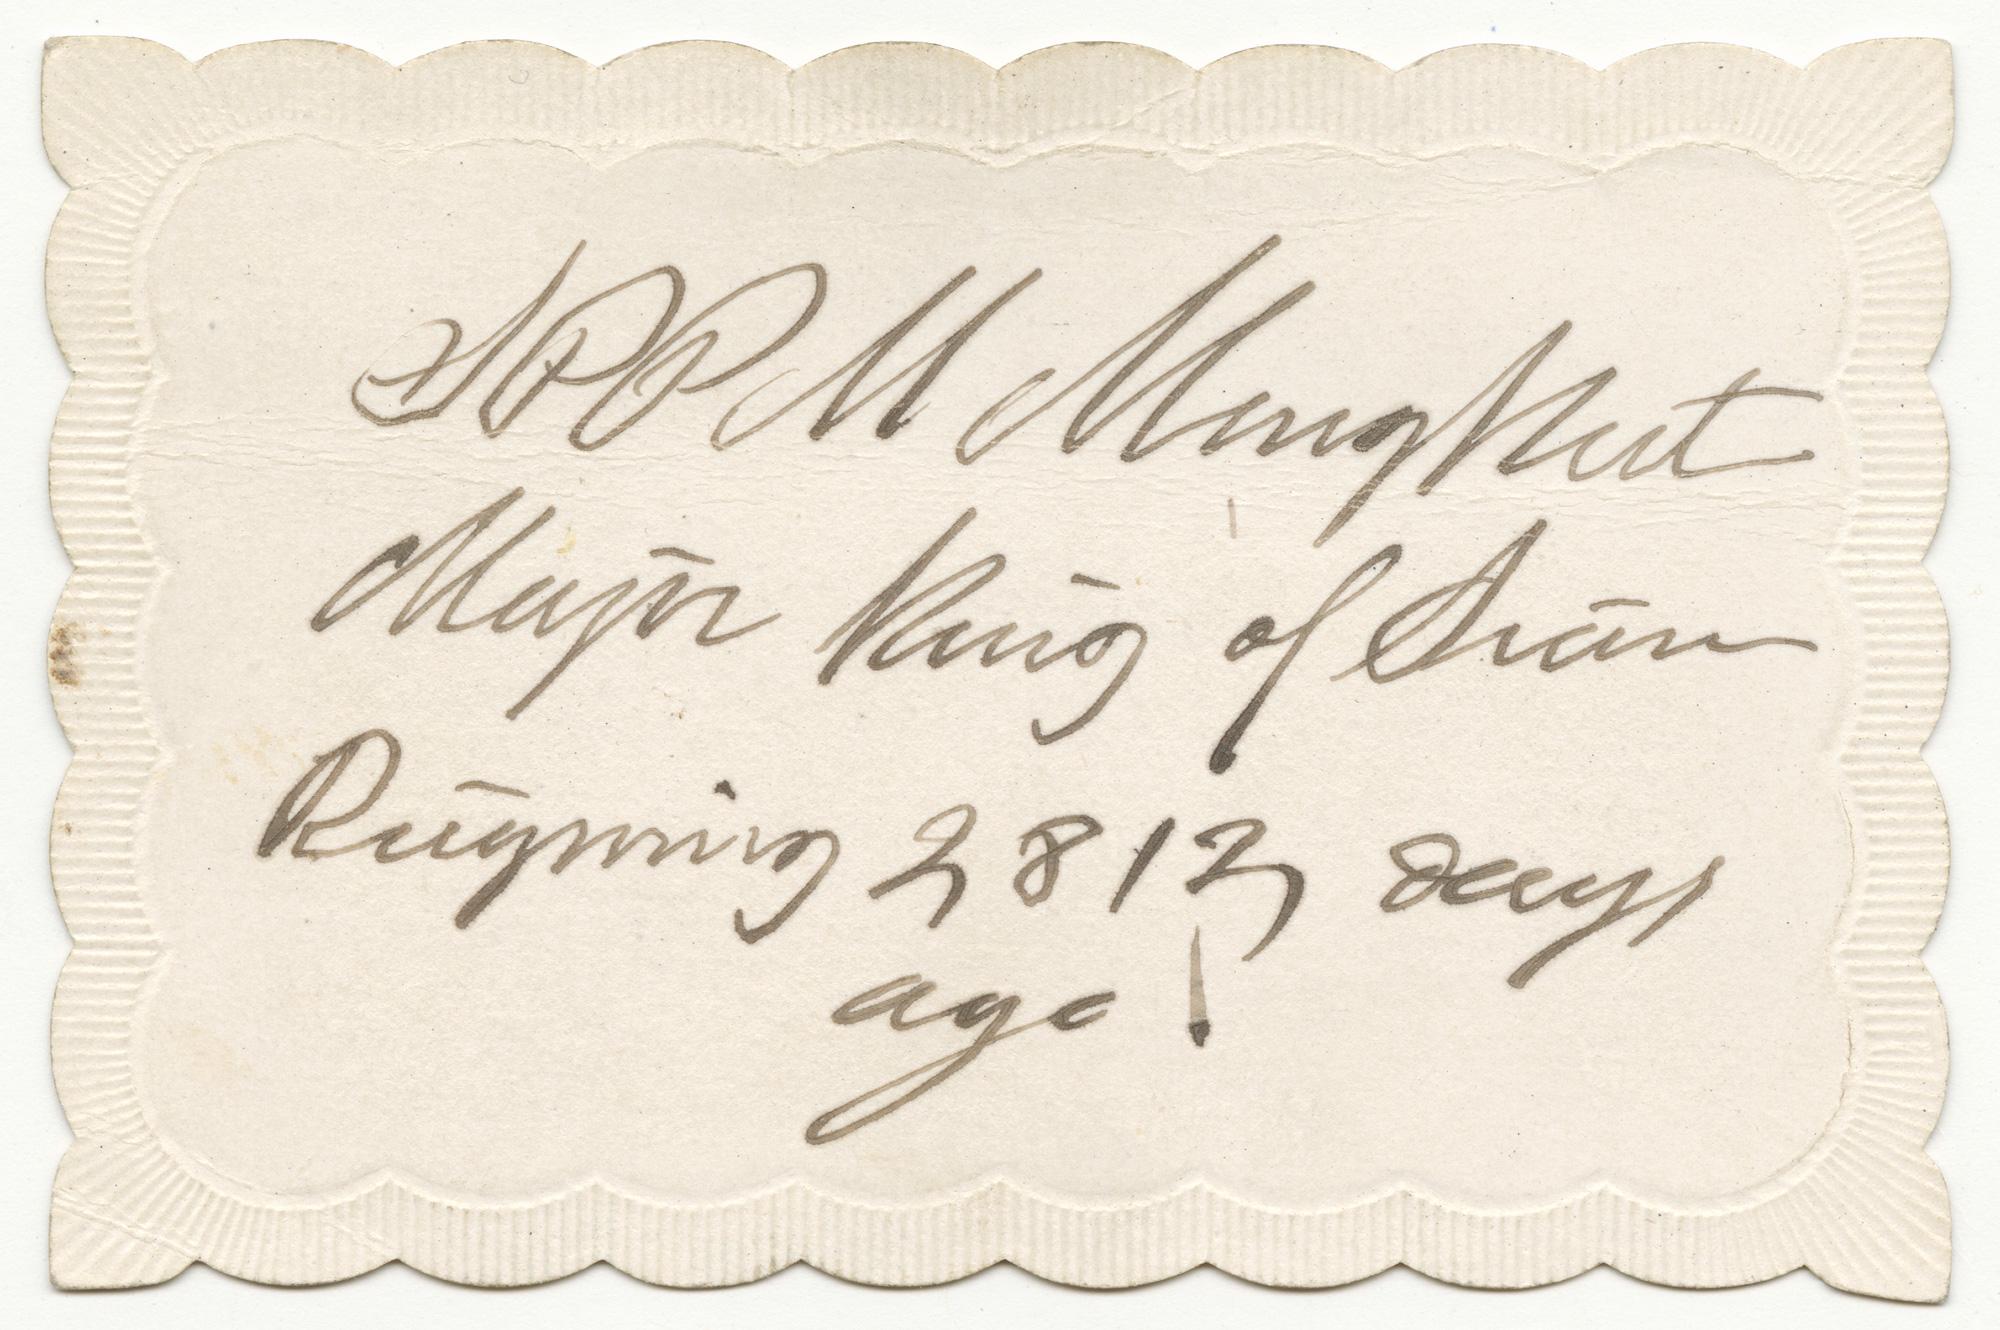 Calling Cards from King Mongkut to President Franklin Pierce, 1859 Courtesy of the National Archives and Records Administration, General Records of the United States Government; 6923541  บัตรพระปรมาภิไธยของพระบาทสมเด็จพระจอมเกล้าเจ้าอยู่หัว พระราชทานแก่ประธานาธิบดีแฟรงกลิน เพียร์ซ พ.ศ. ๒๔๐๒ ได้รับความอนุเคราะห์จากแผนกบันทึกทั่วไปของรัฐบาลสหรัฐอเมริกา องค์การบริหารจดหมายเหตุและบันทึกแห่งชาติ; 6923541